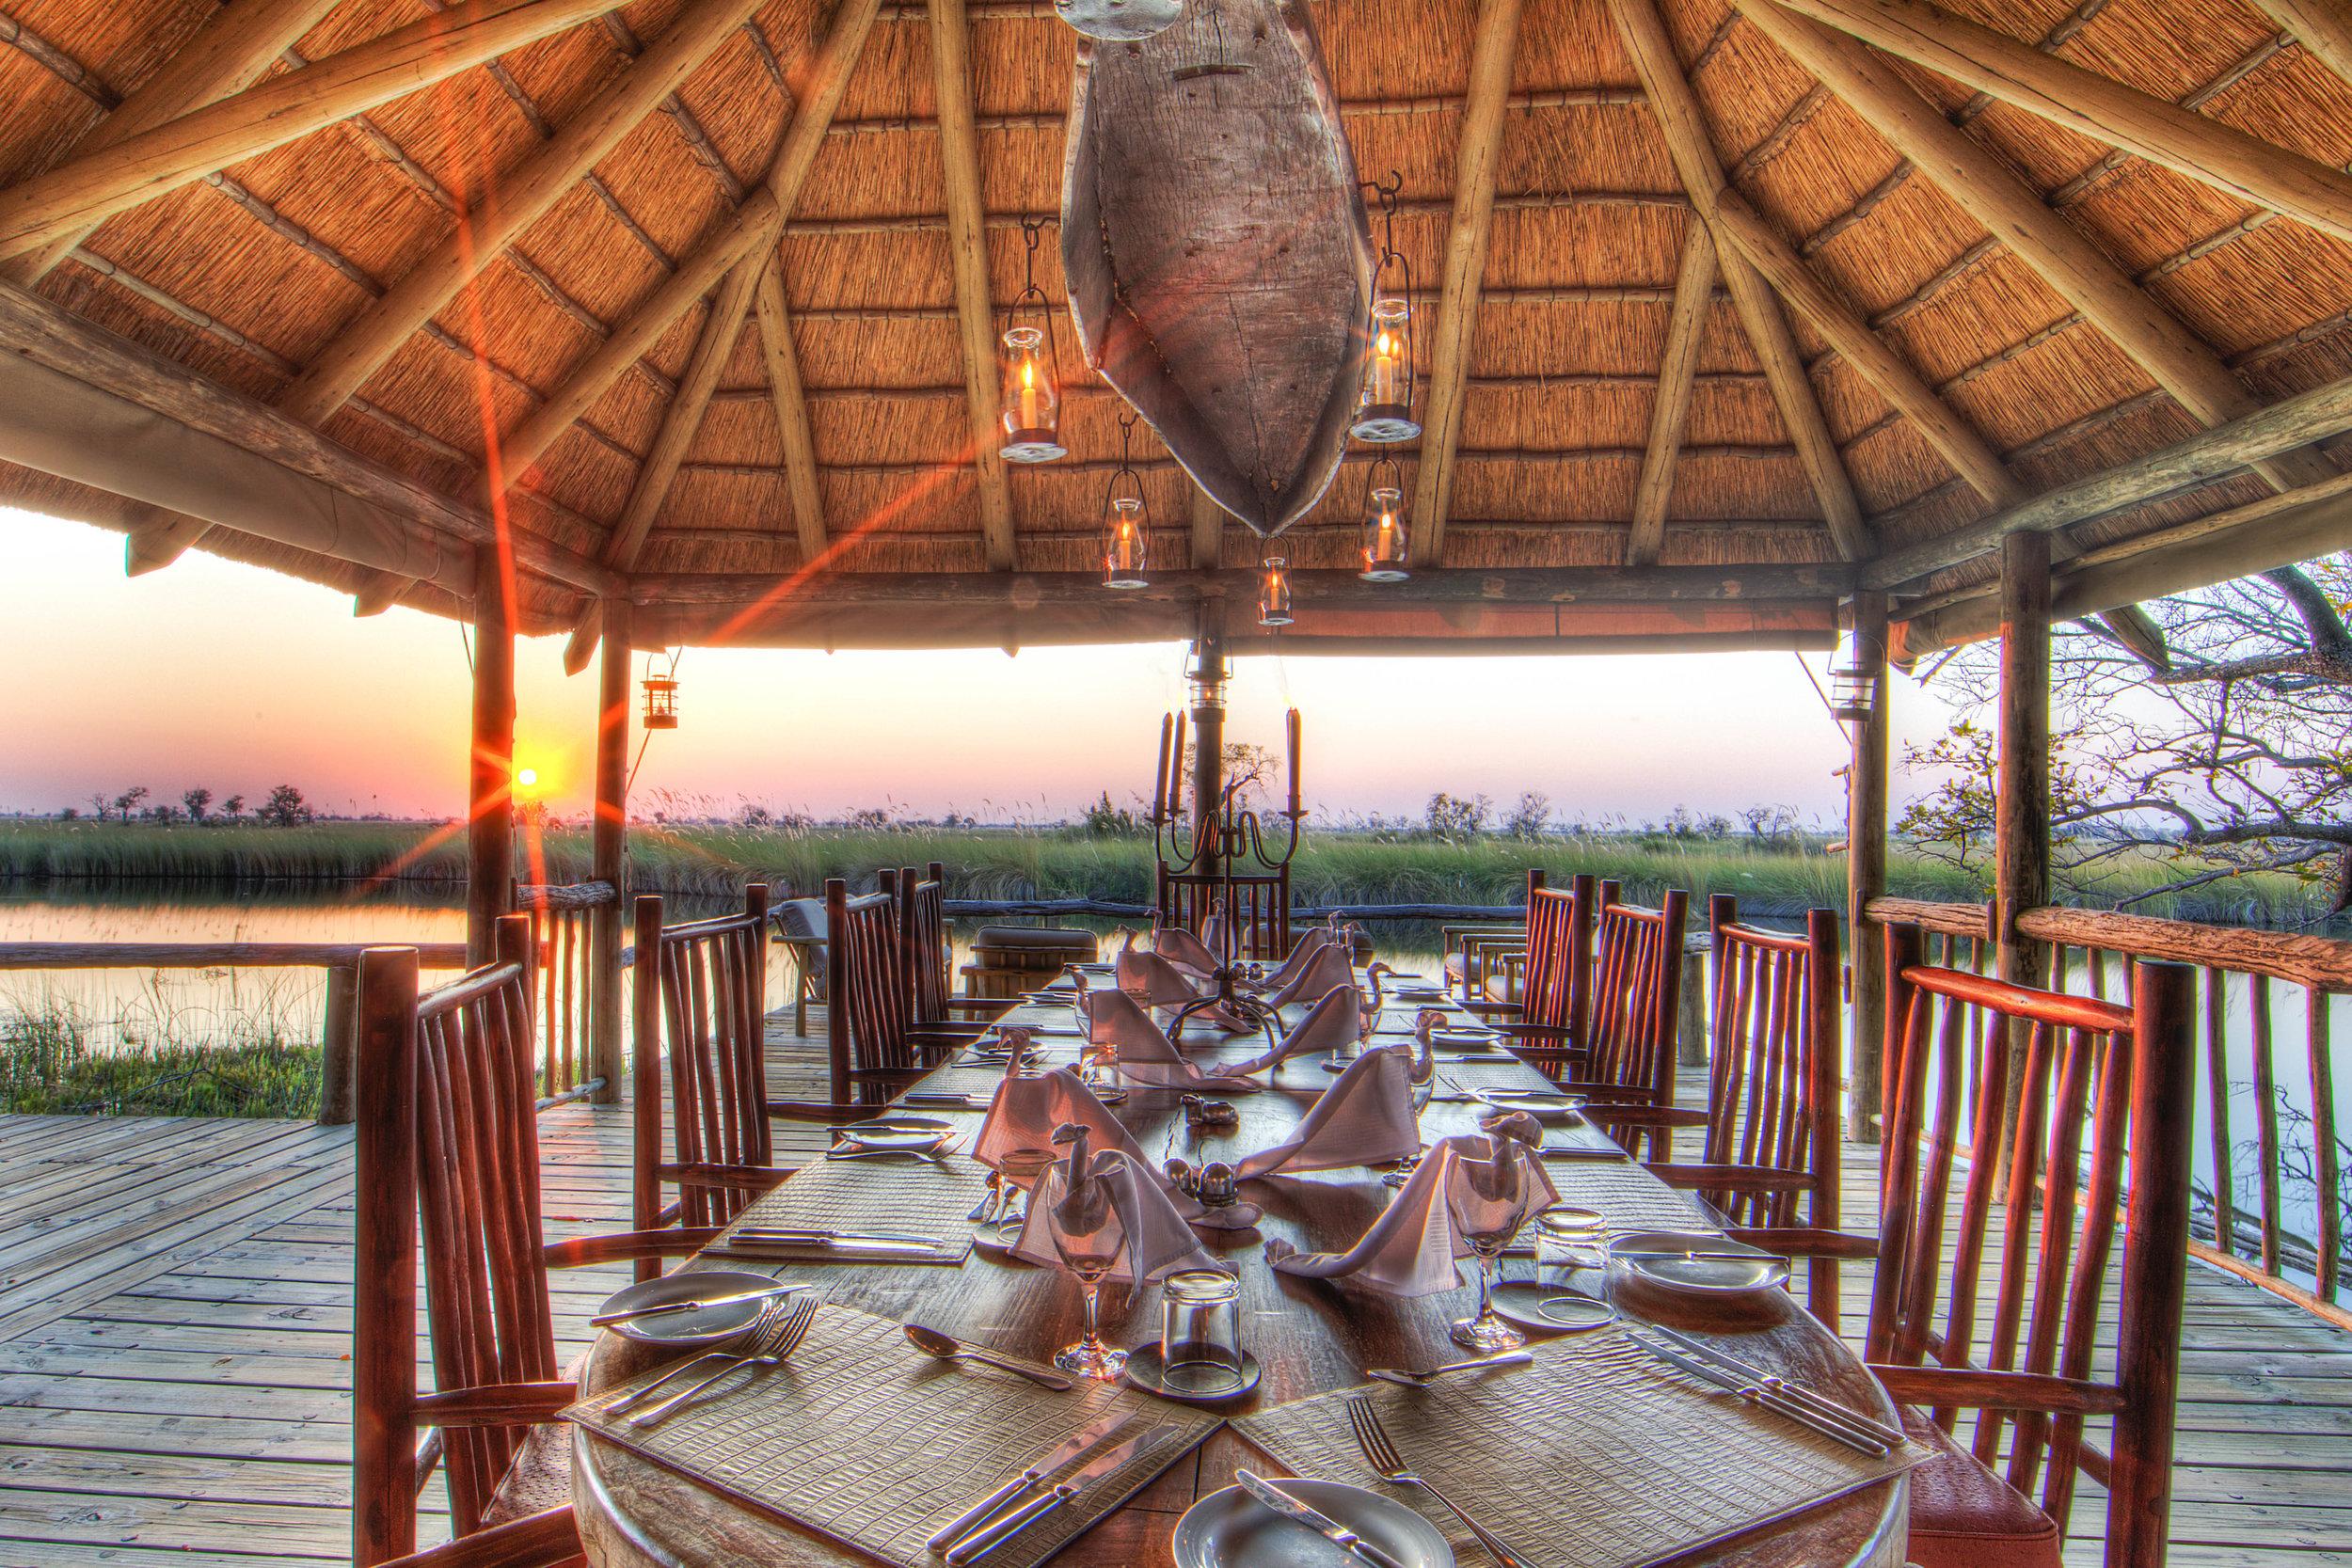 camp-xakanaxa-interior-dining1.jpg